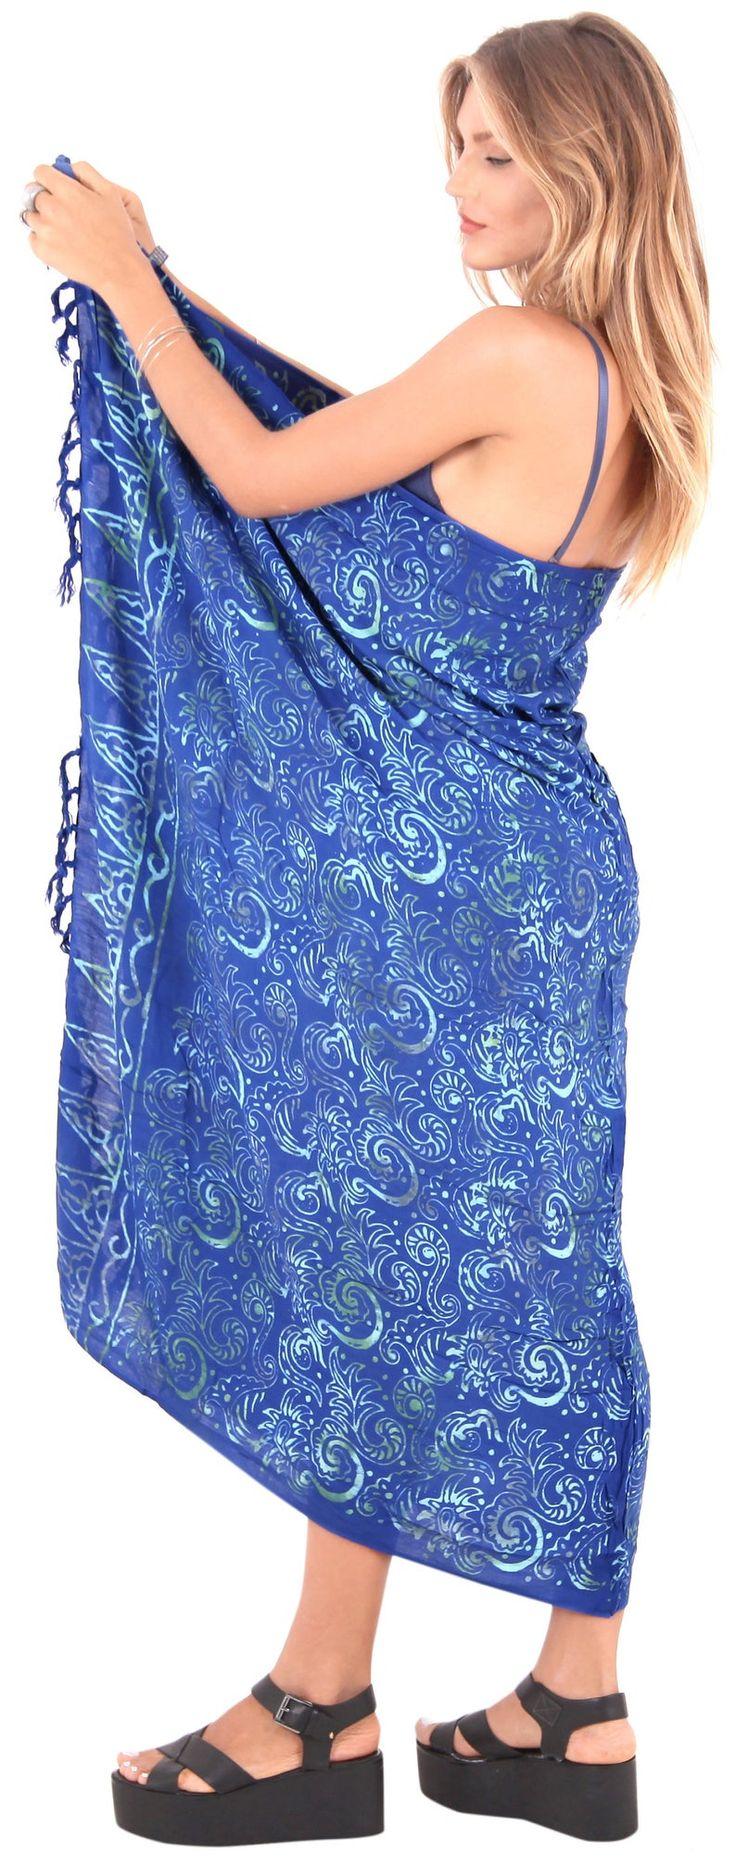 La Leela Sarong Bathing Suit Pareo Wrap Bikini Cover up Womens Skirt Swimsuit Swimwear – LIGHT BLUE- 901595